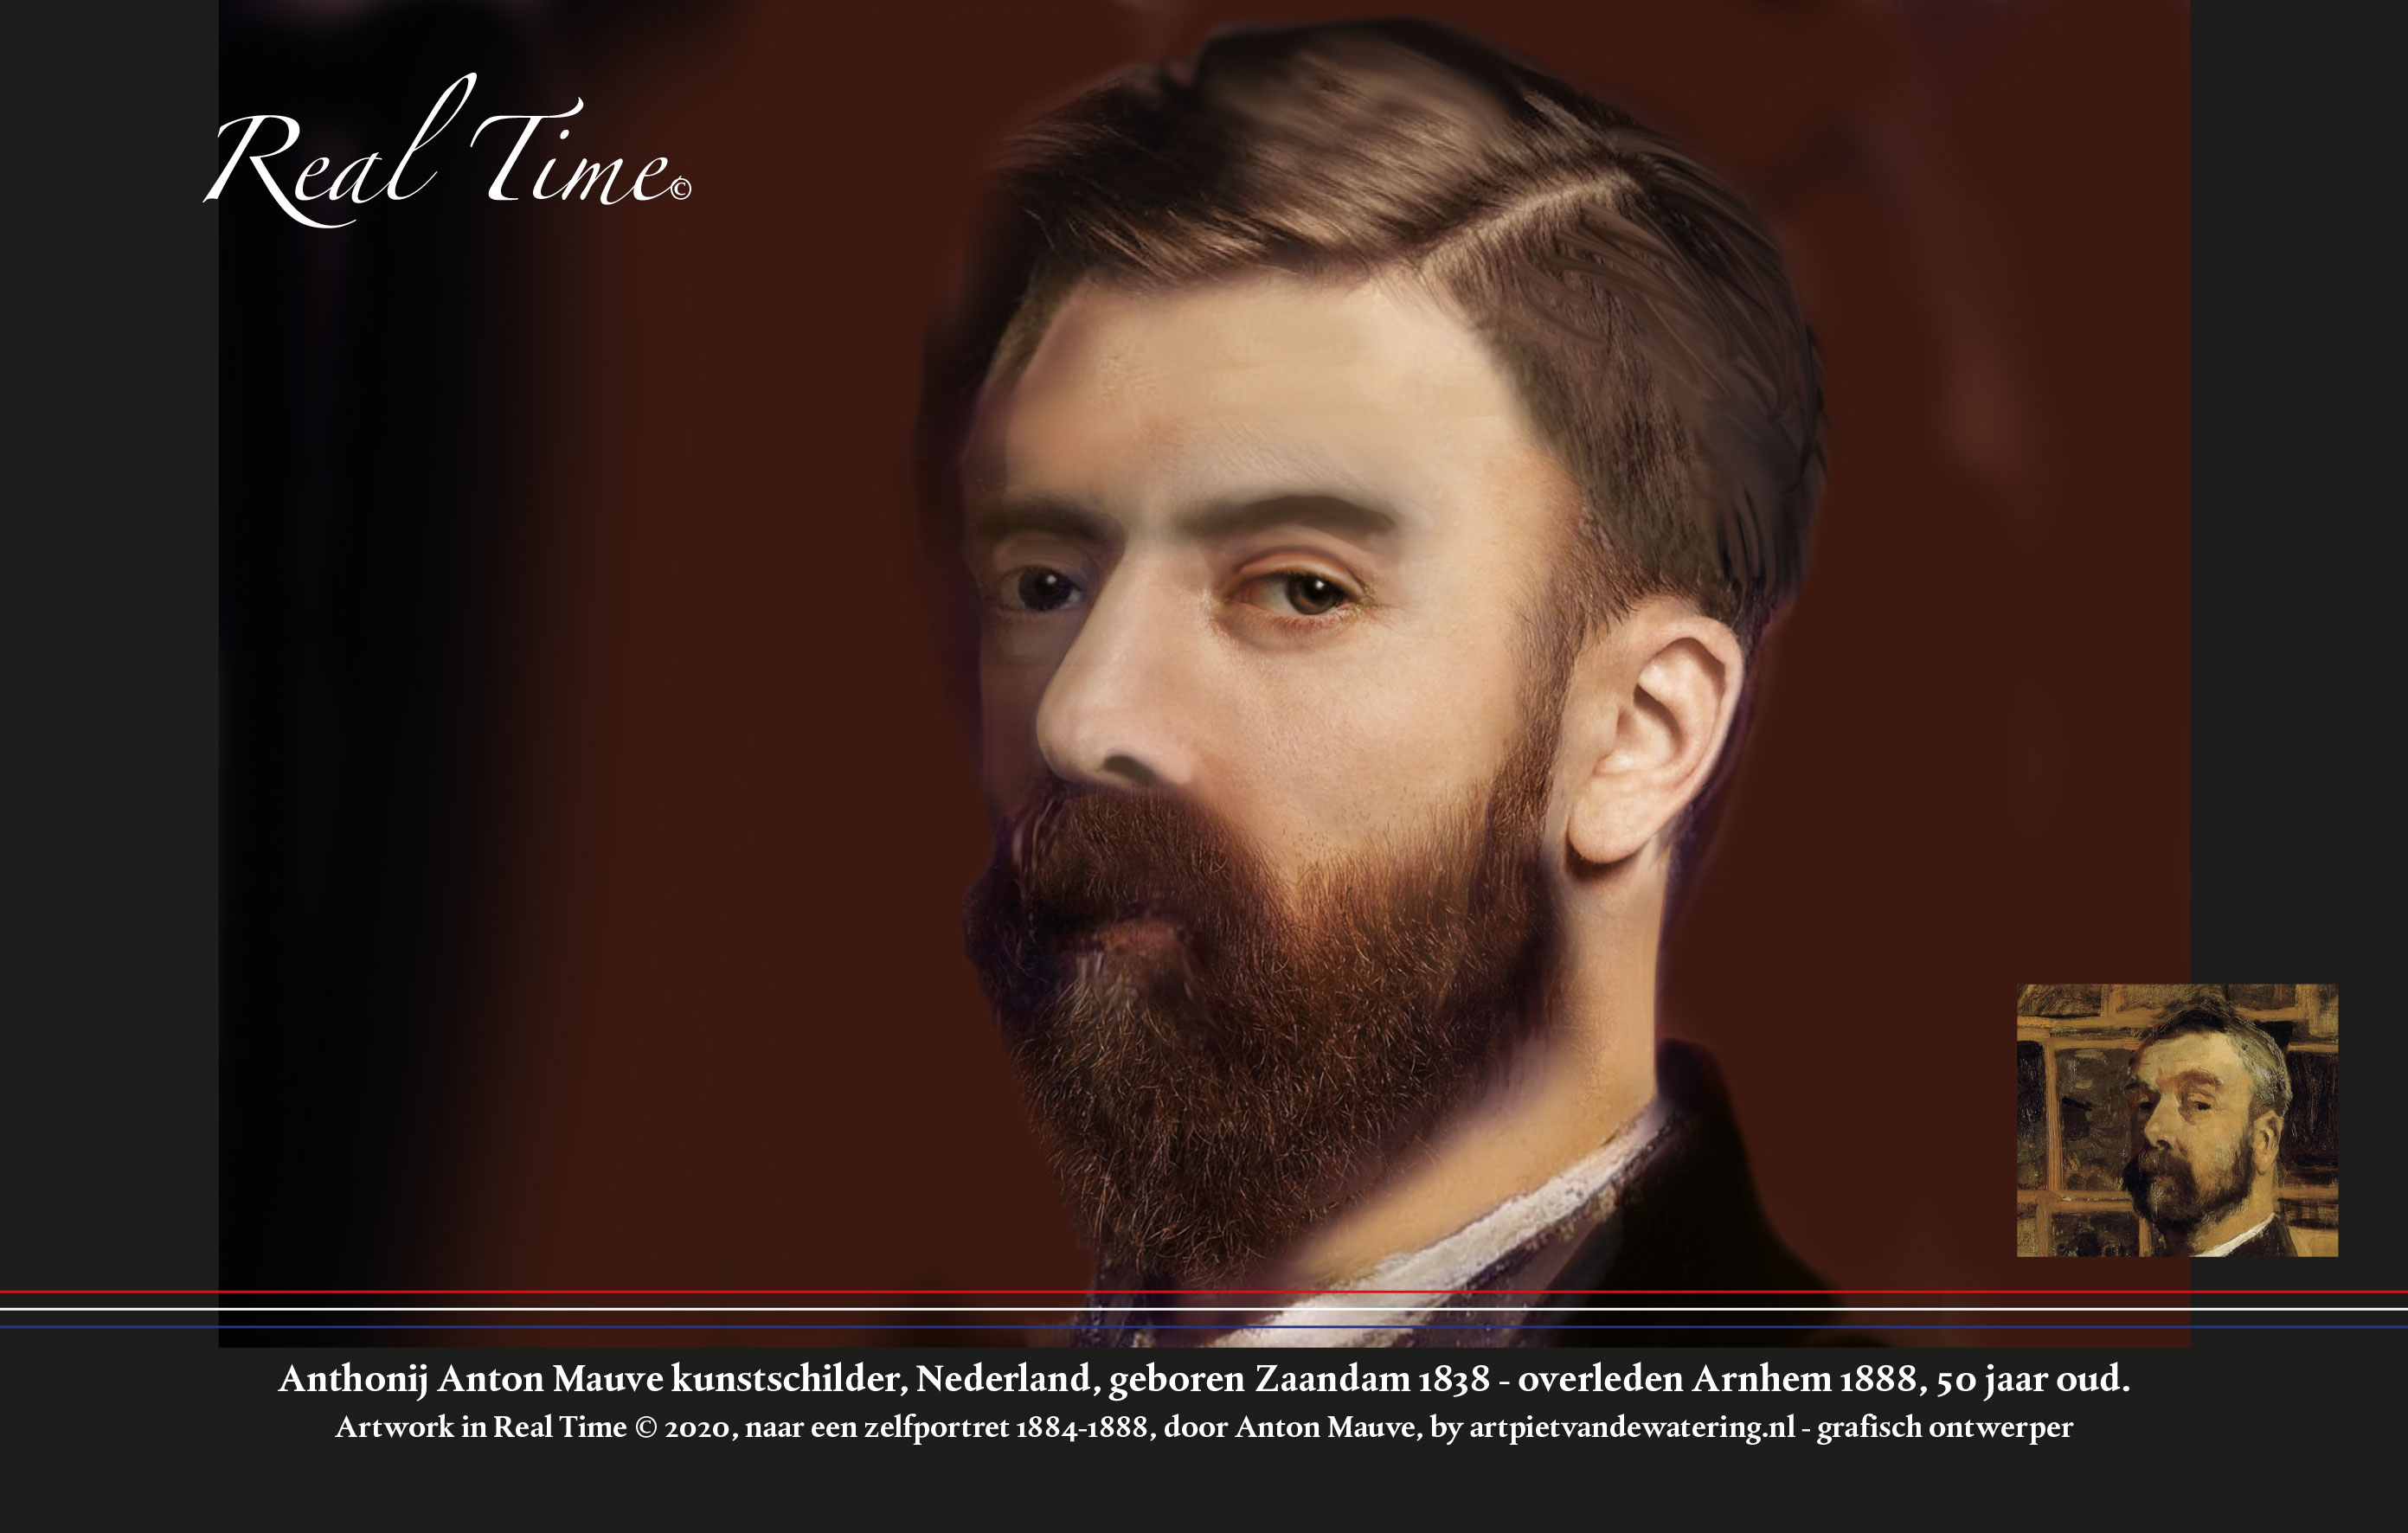 Anthonij-A-Mauve-1838-1888